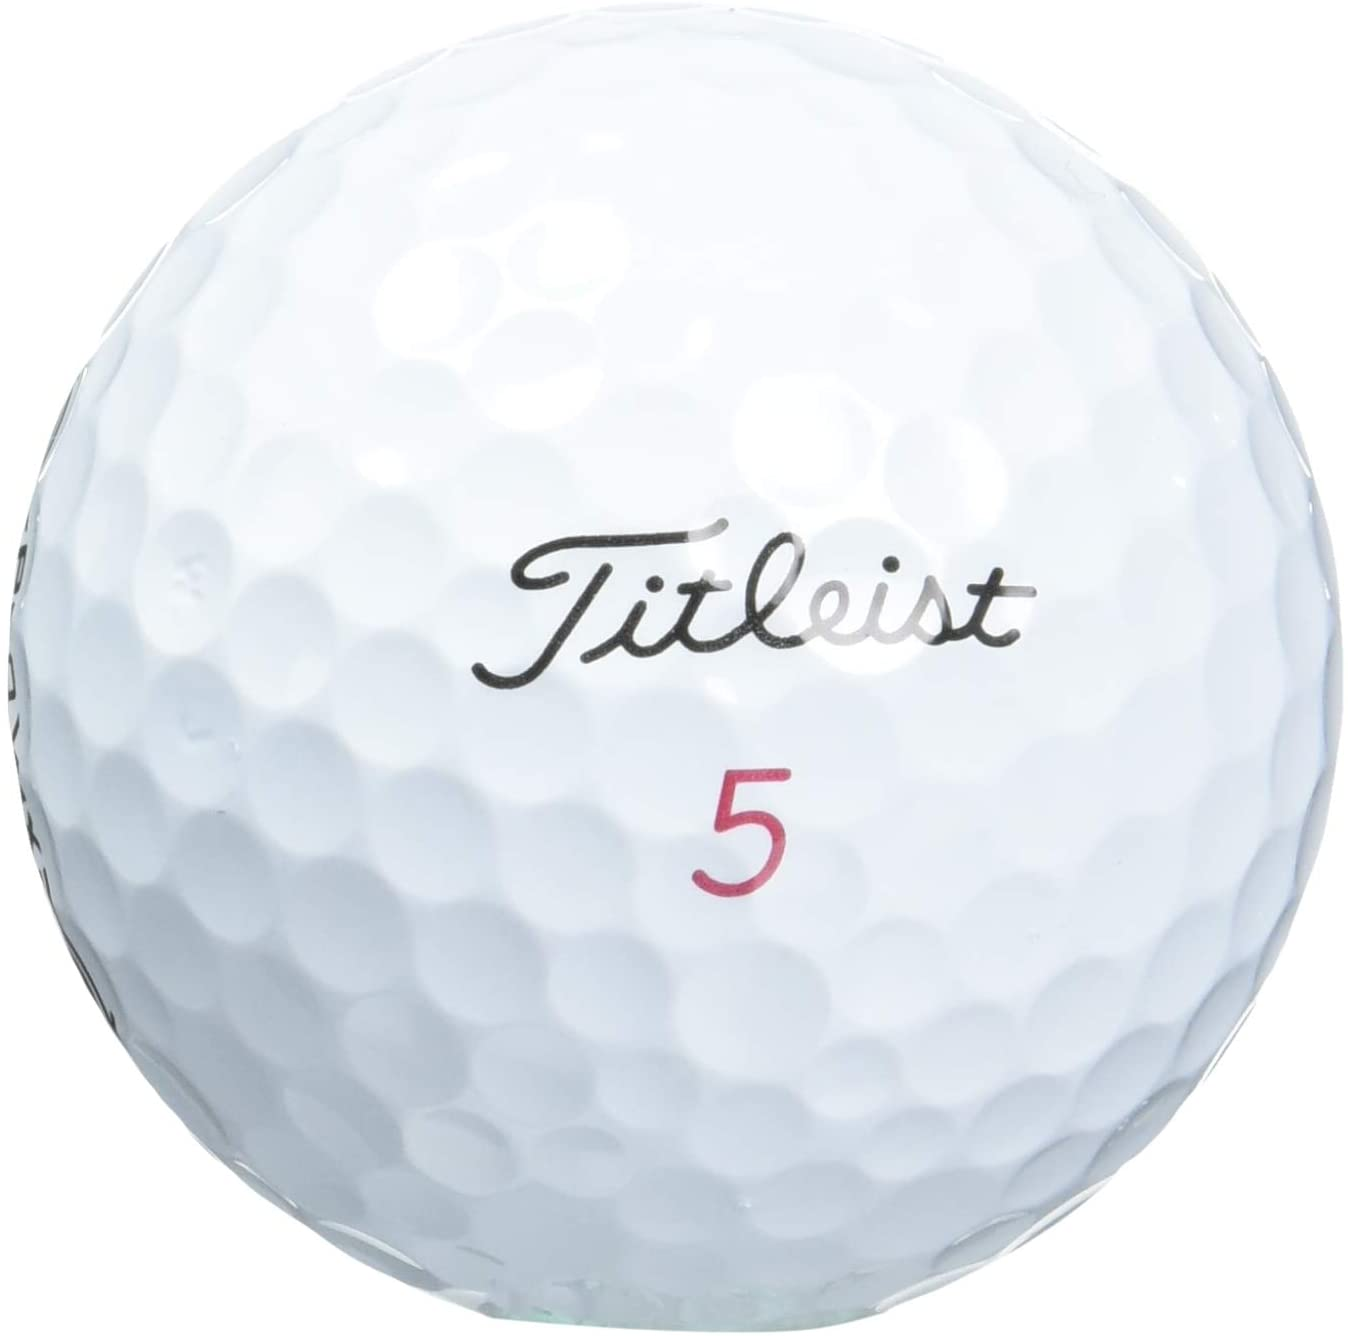 Titleist pro v1, best golf balls 2021